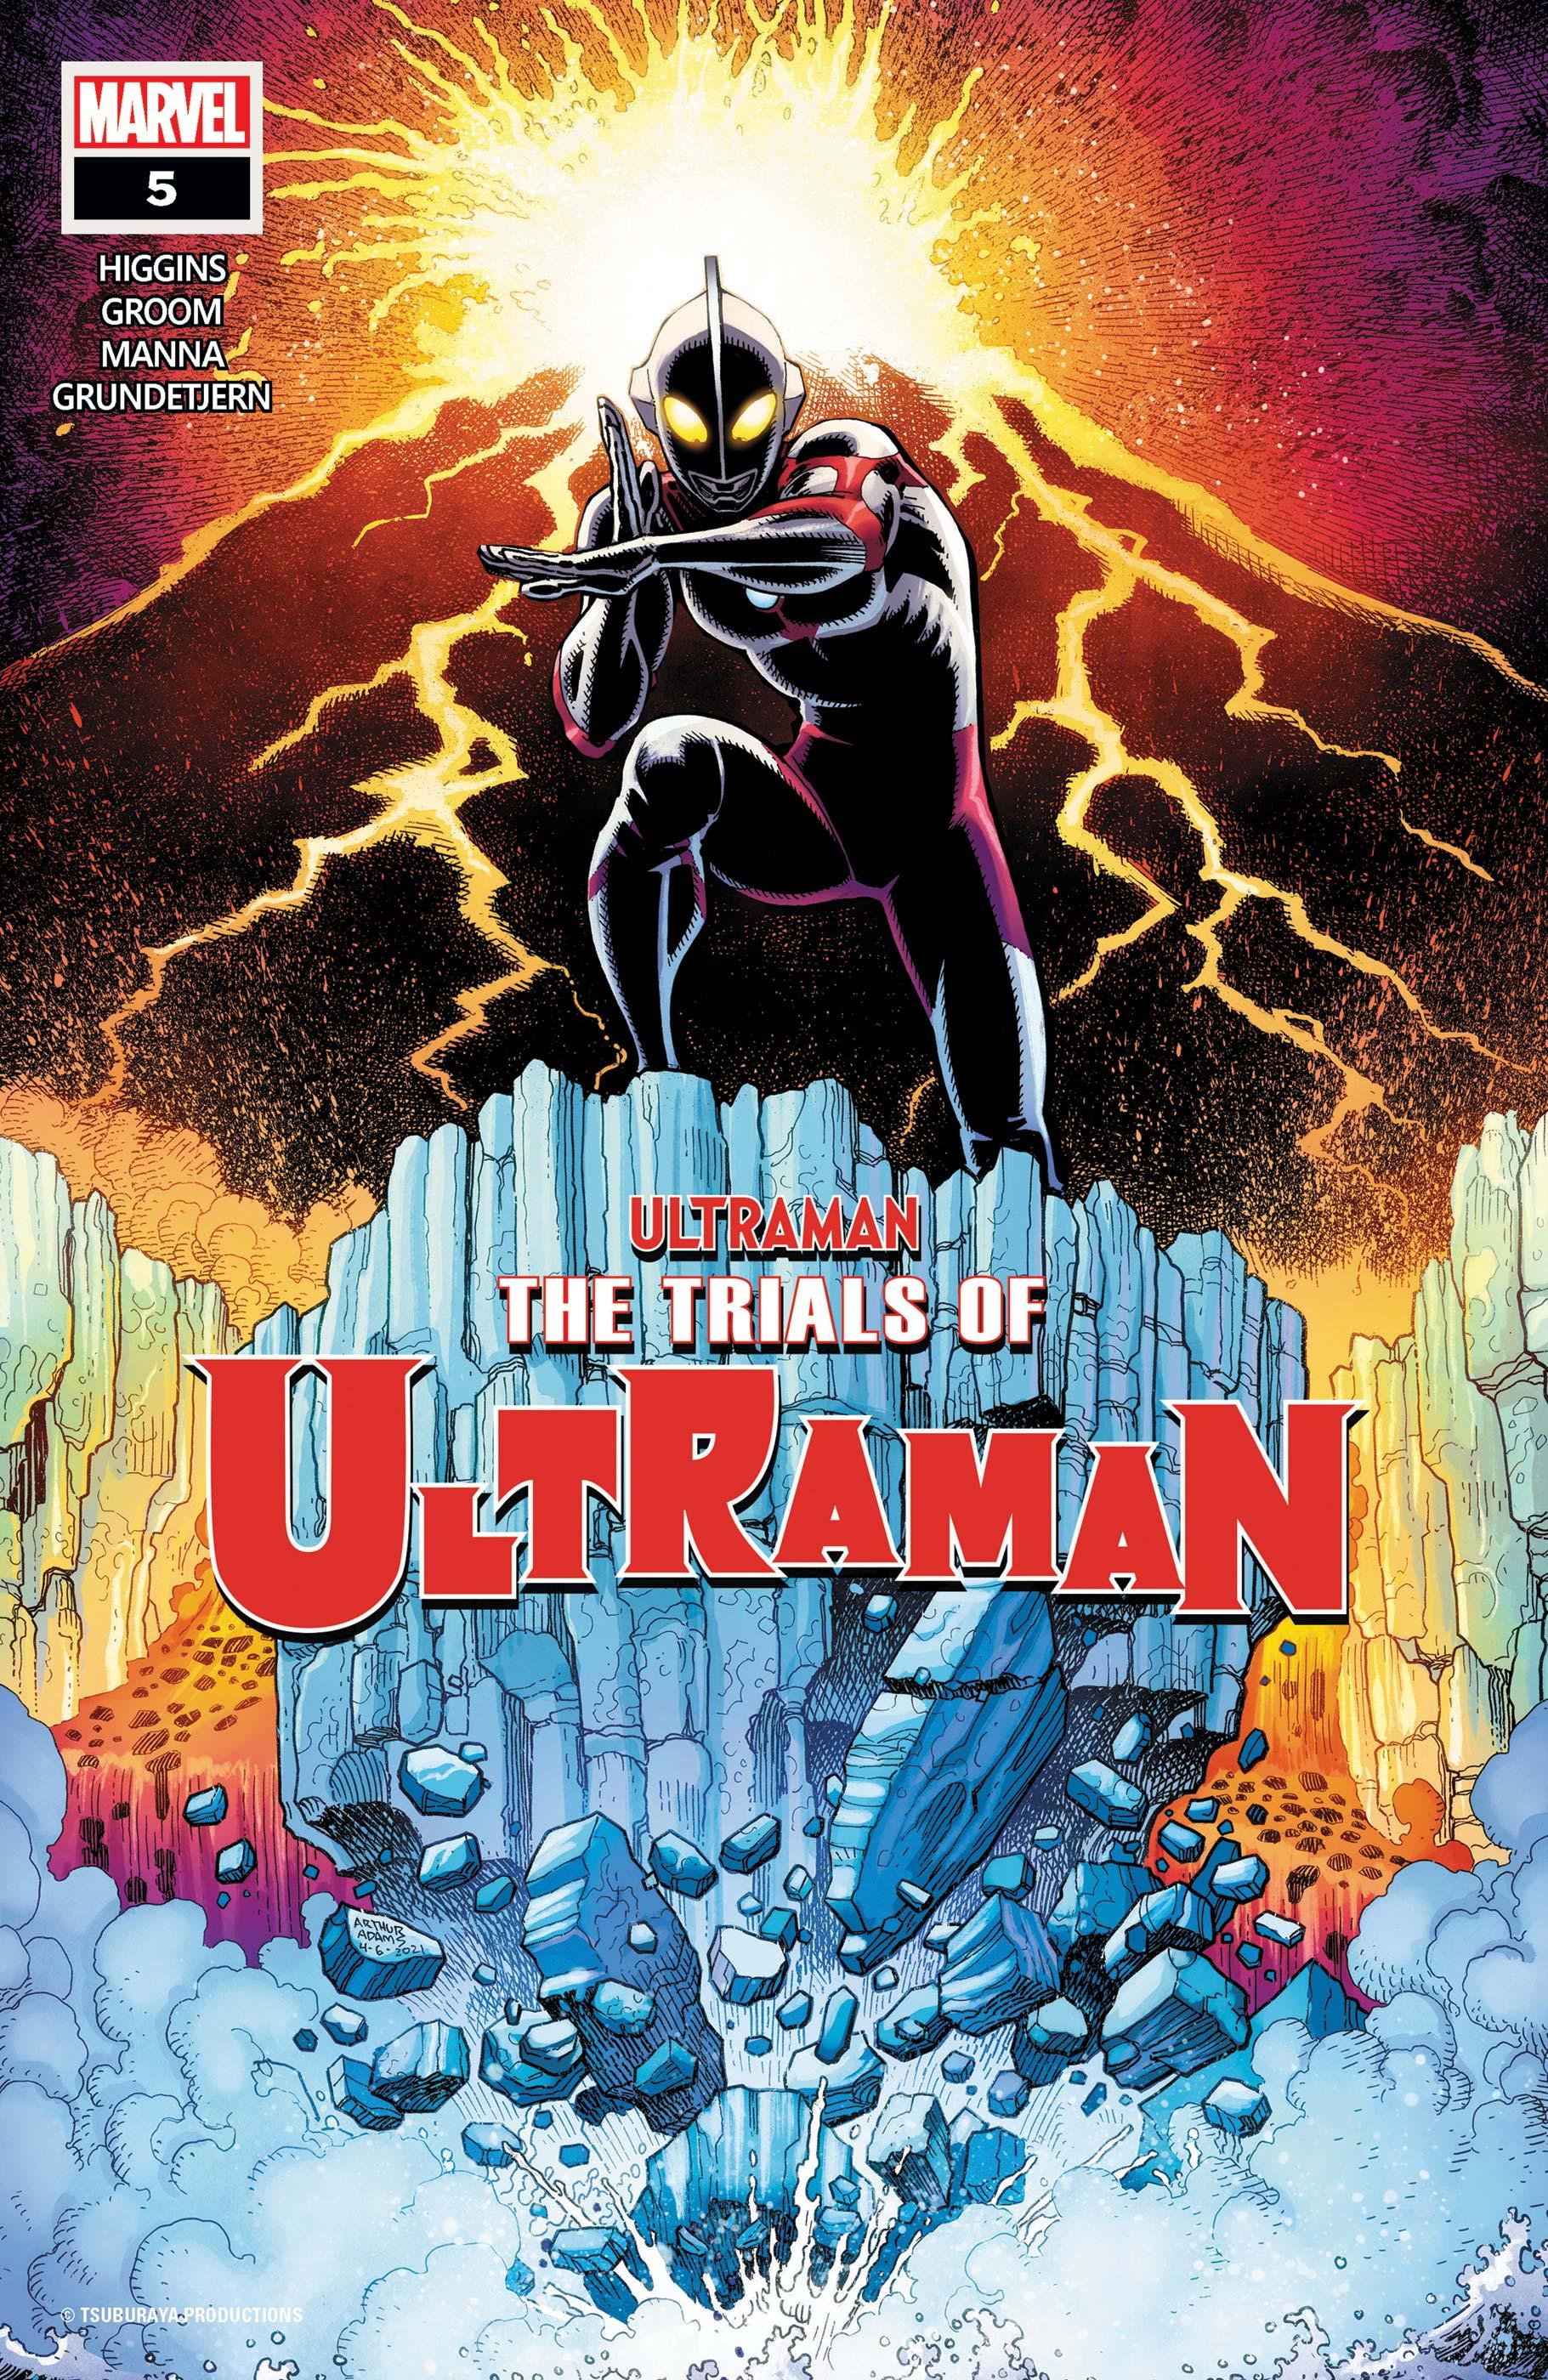 The Trials of Ultraman (2021) #5